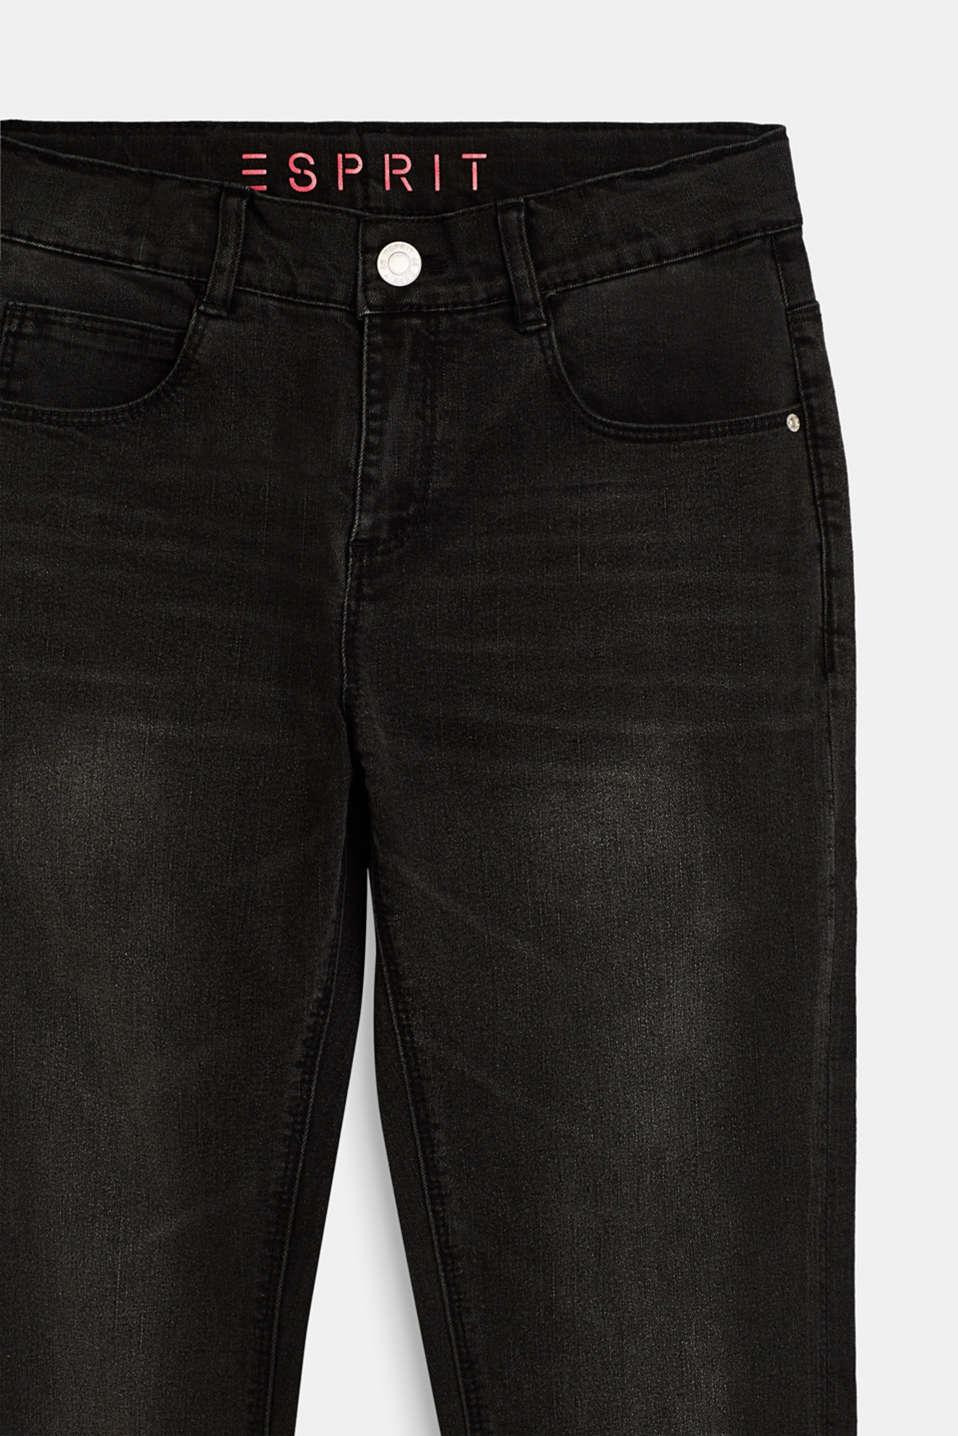 Pants denim, LCBLACK DENIM, detail image number 3